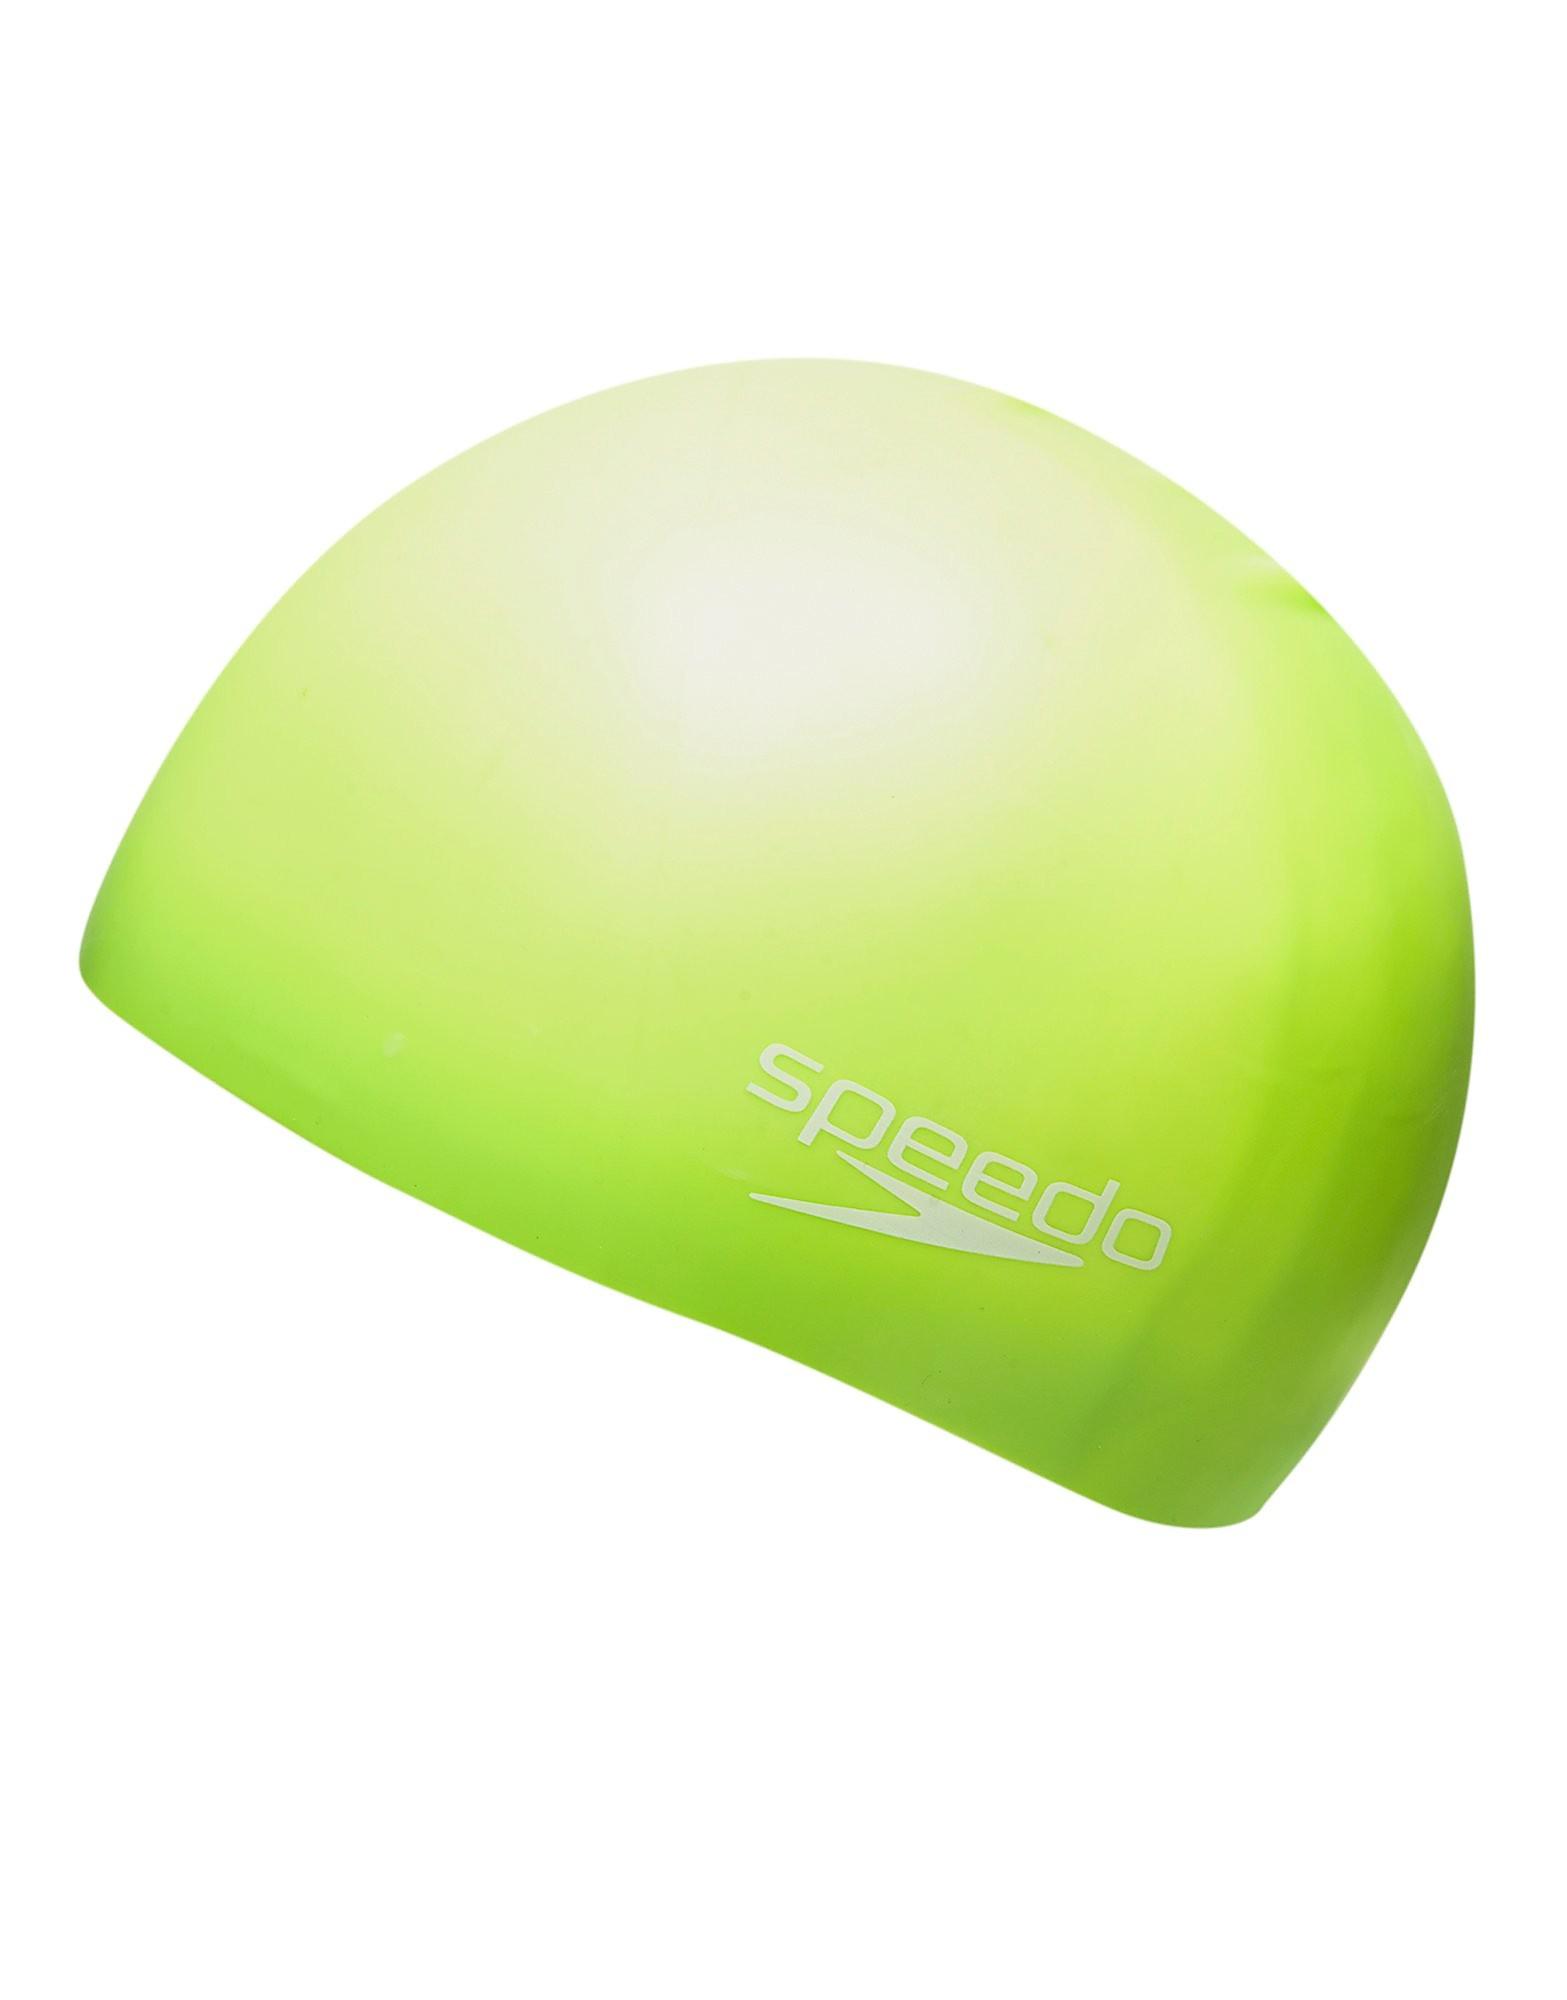 Speedo Plain Moulded Cap